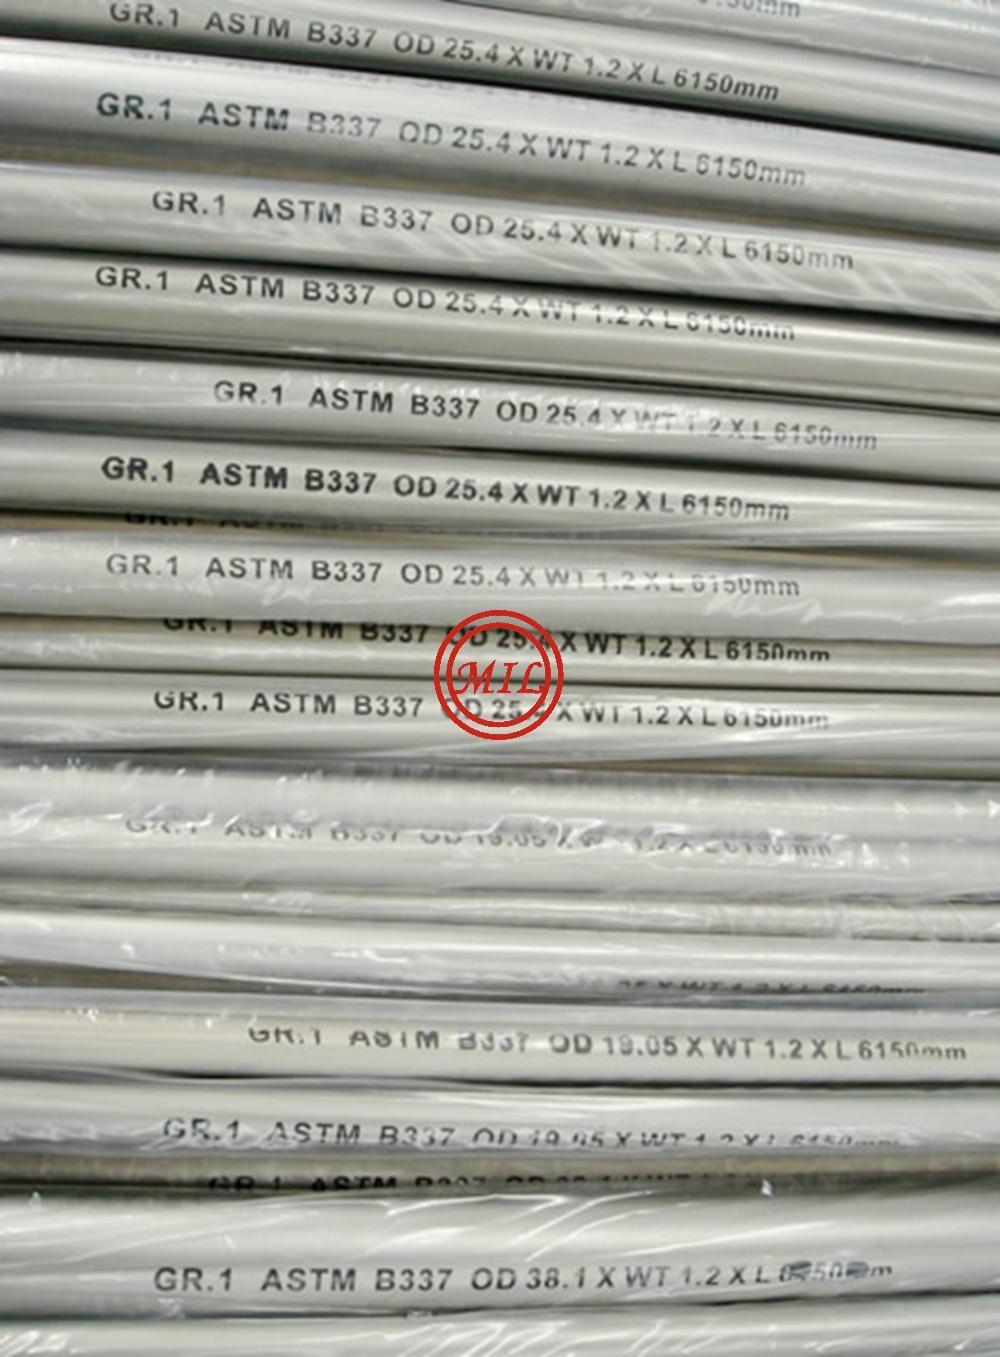 ASTM B337 GR.1 TITANIUM TUBES